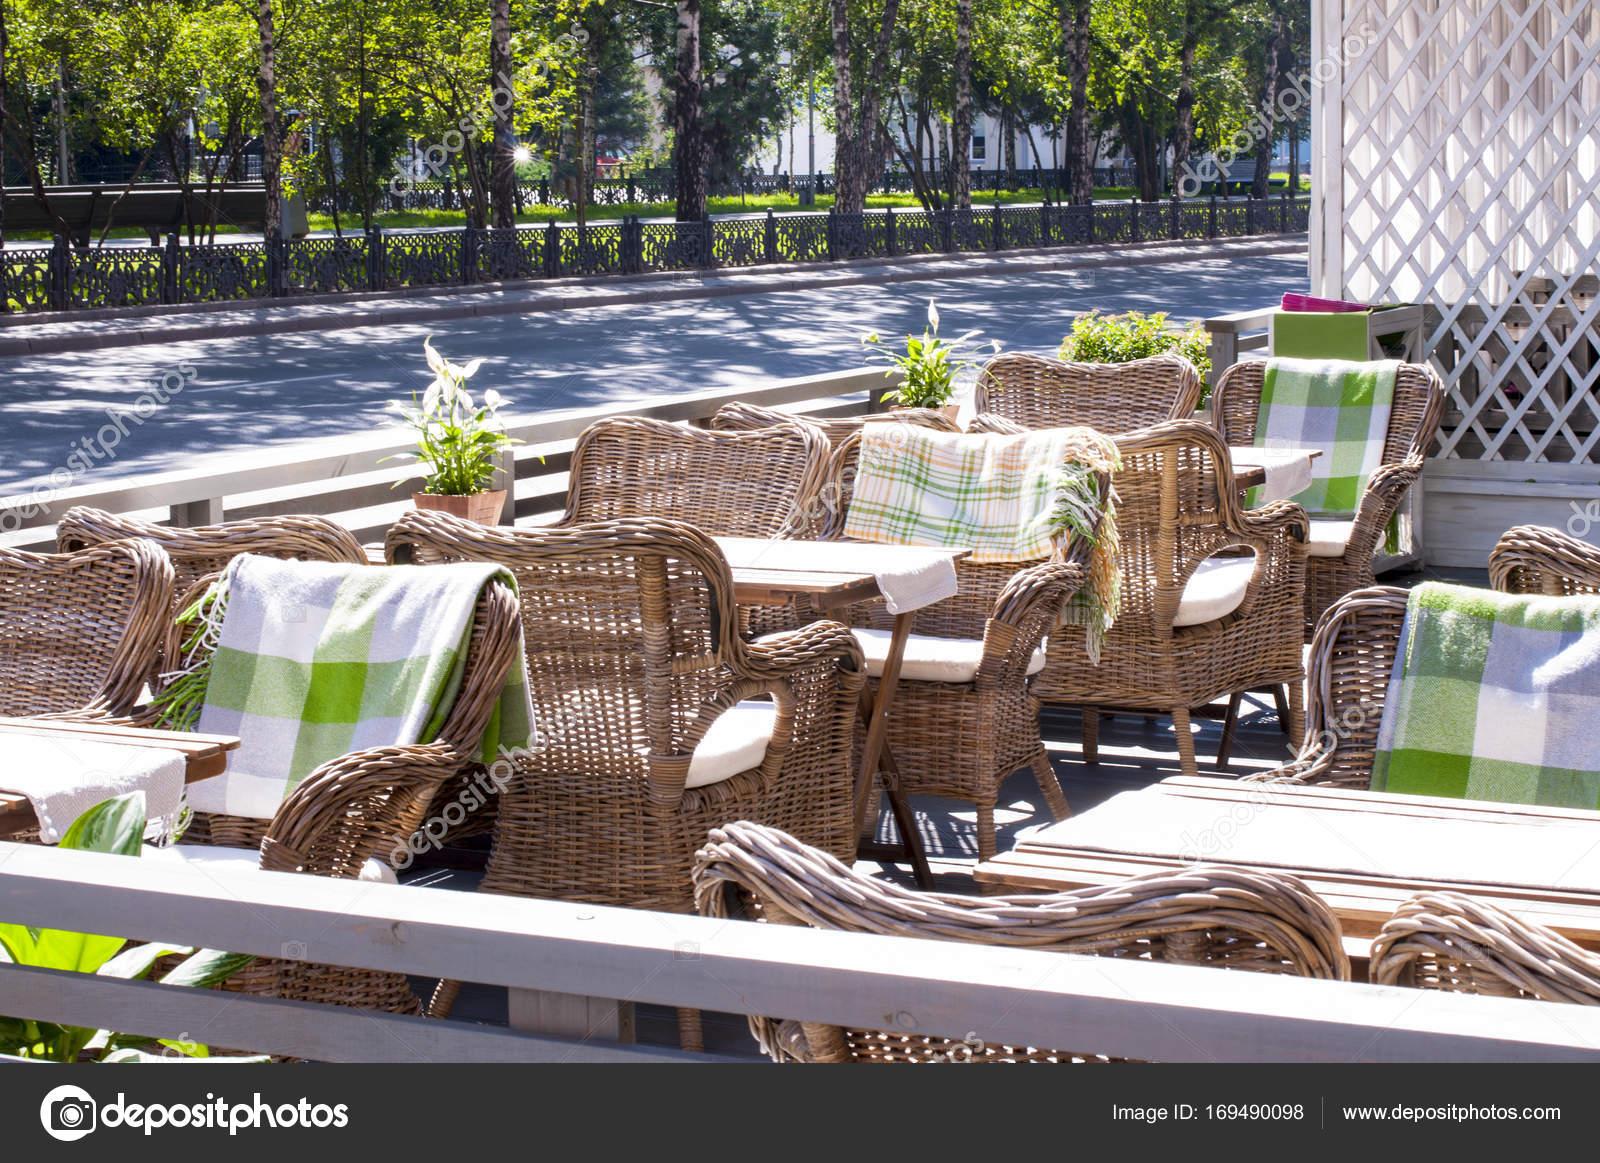 Sedie di paglia in una caffetteria in stile europeo u foto stock